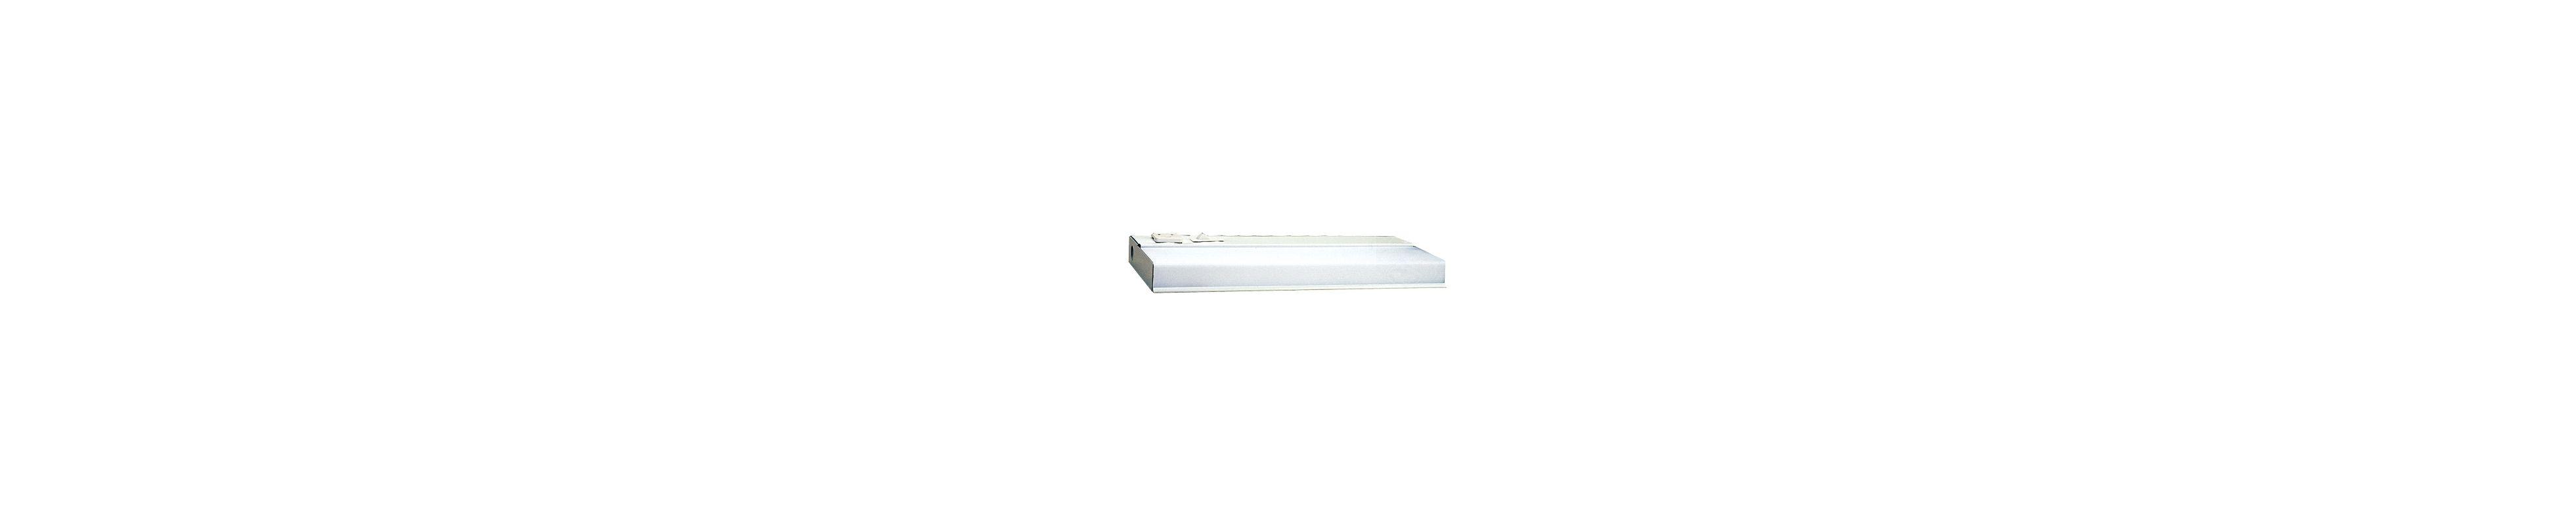 "Elco EUN42E 42.5"" Fluorescent Undercabinet Light White Indoor Lighting"